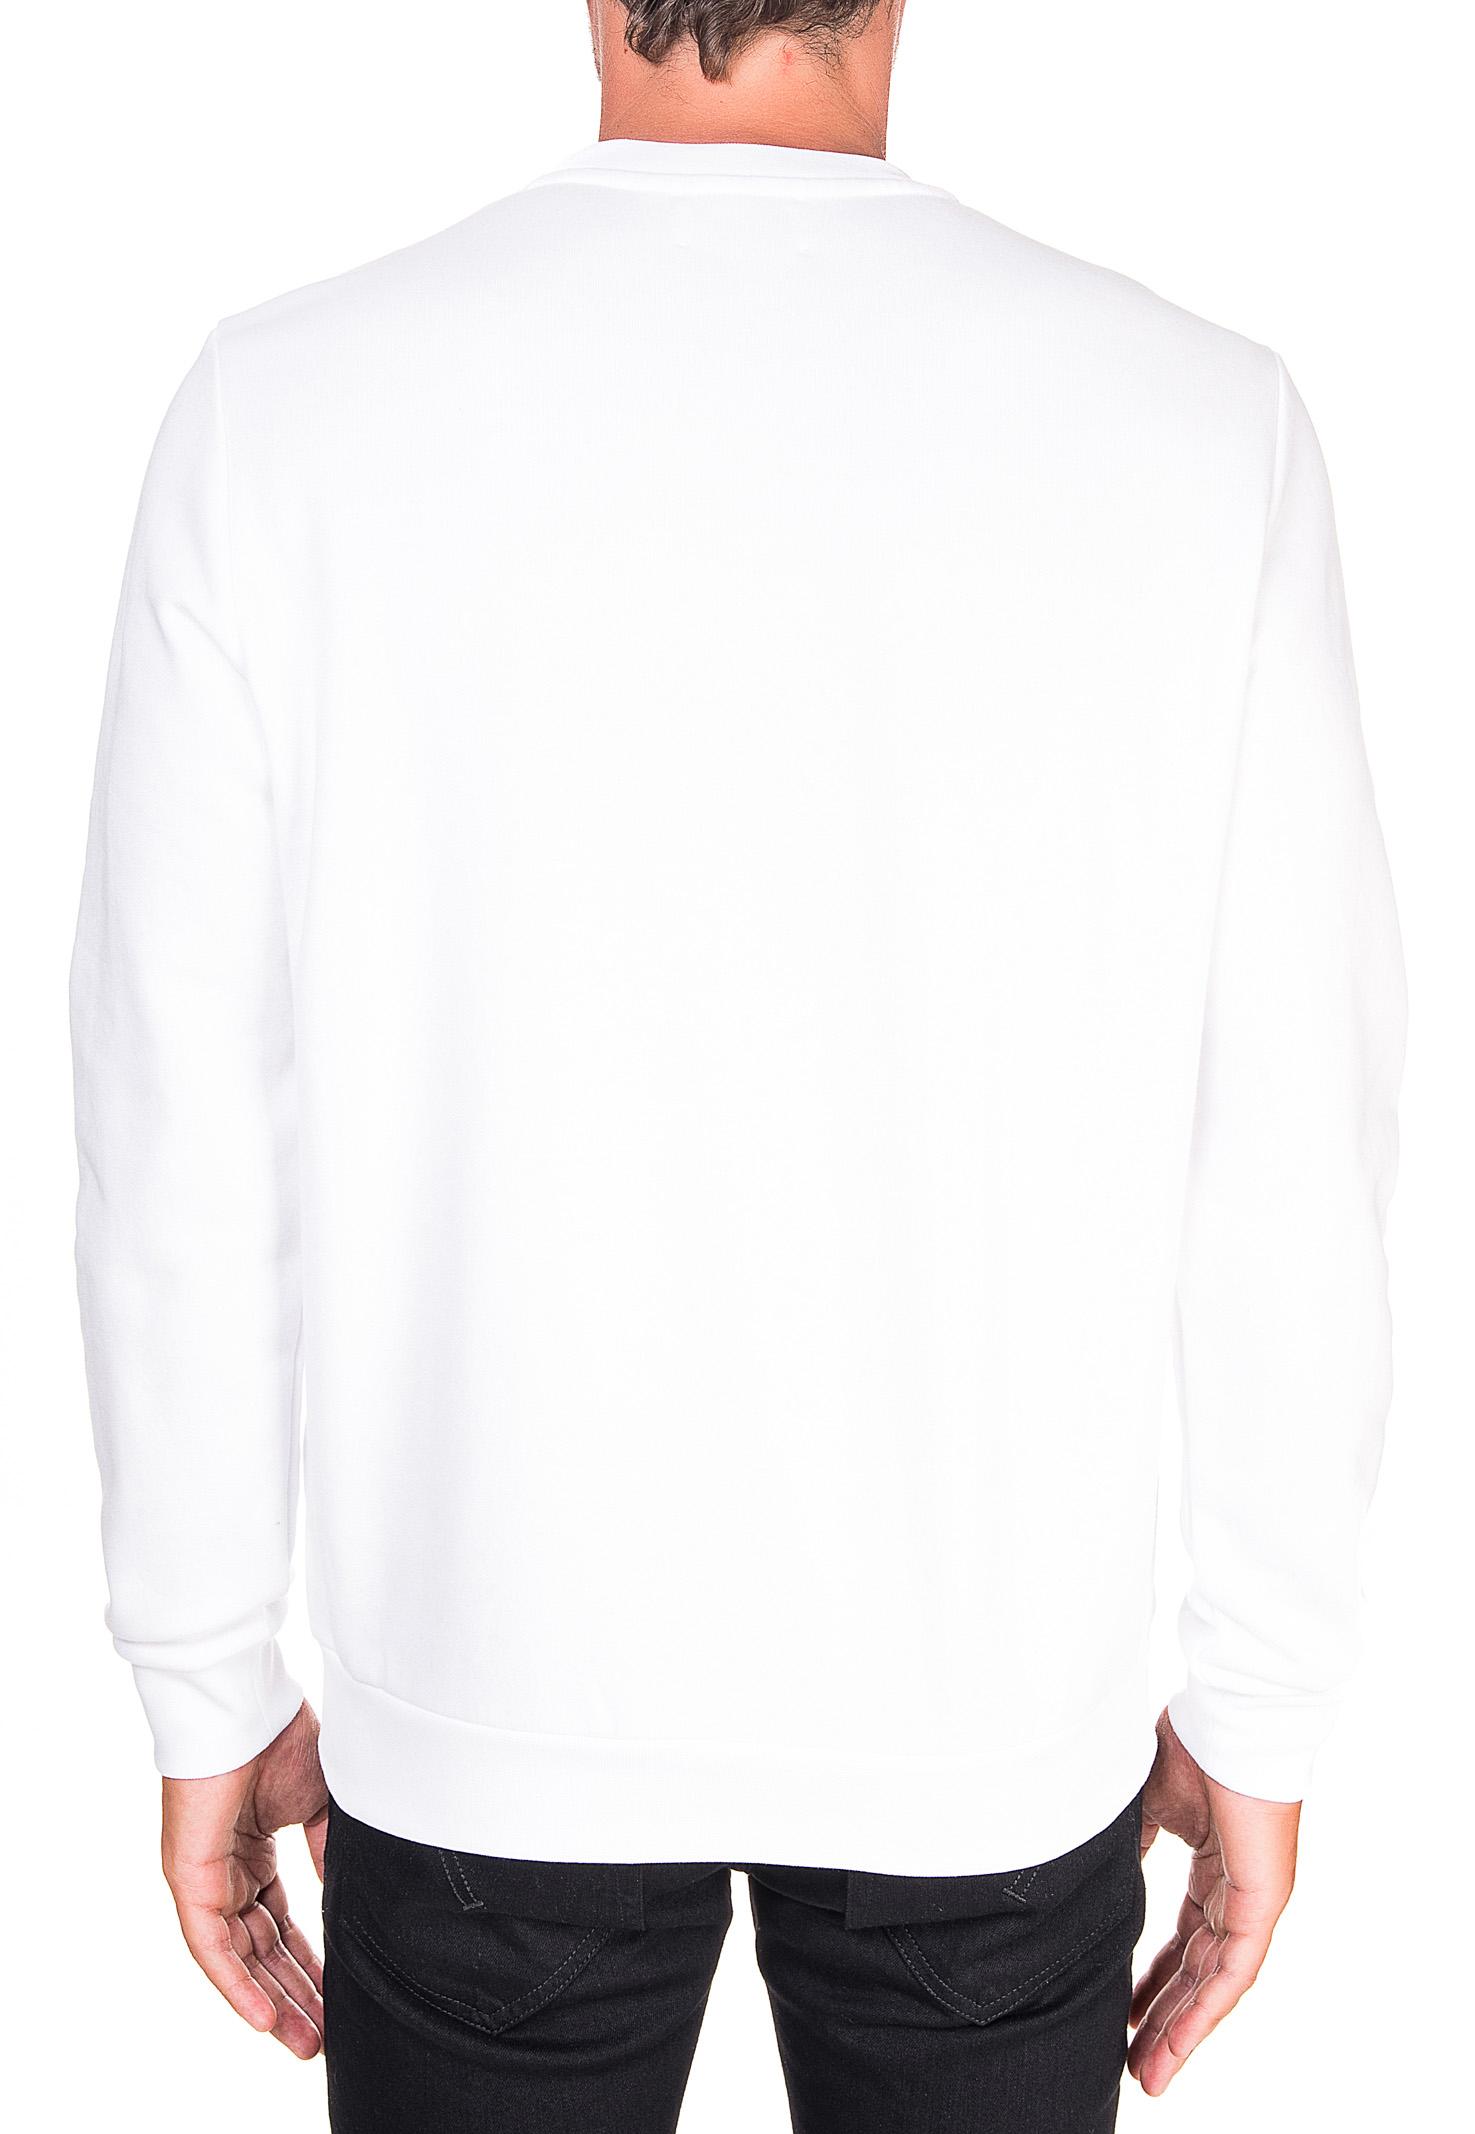 WHITE COTTON SWEATSHIRT WITH FRONT LOGO APPLICATION DONDUP | Sweatshirts | UF617KF0136ZK8DUW20000